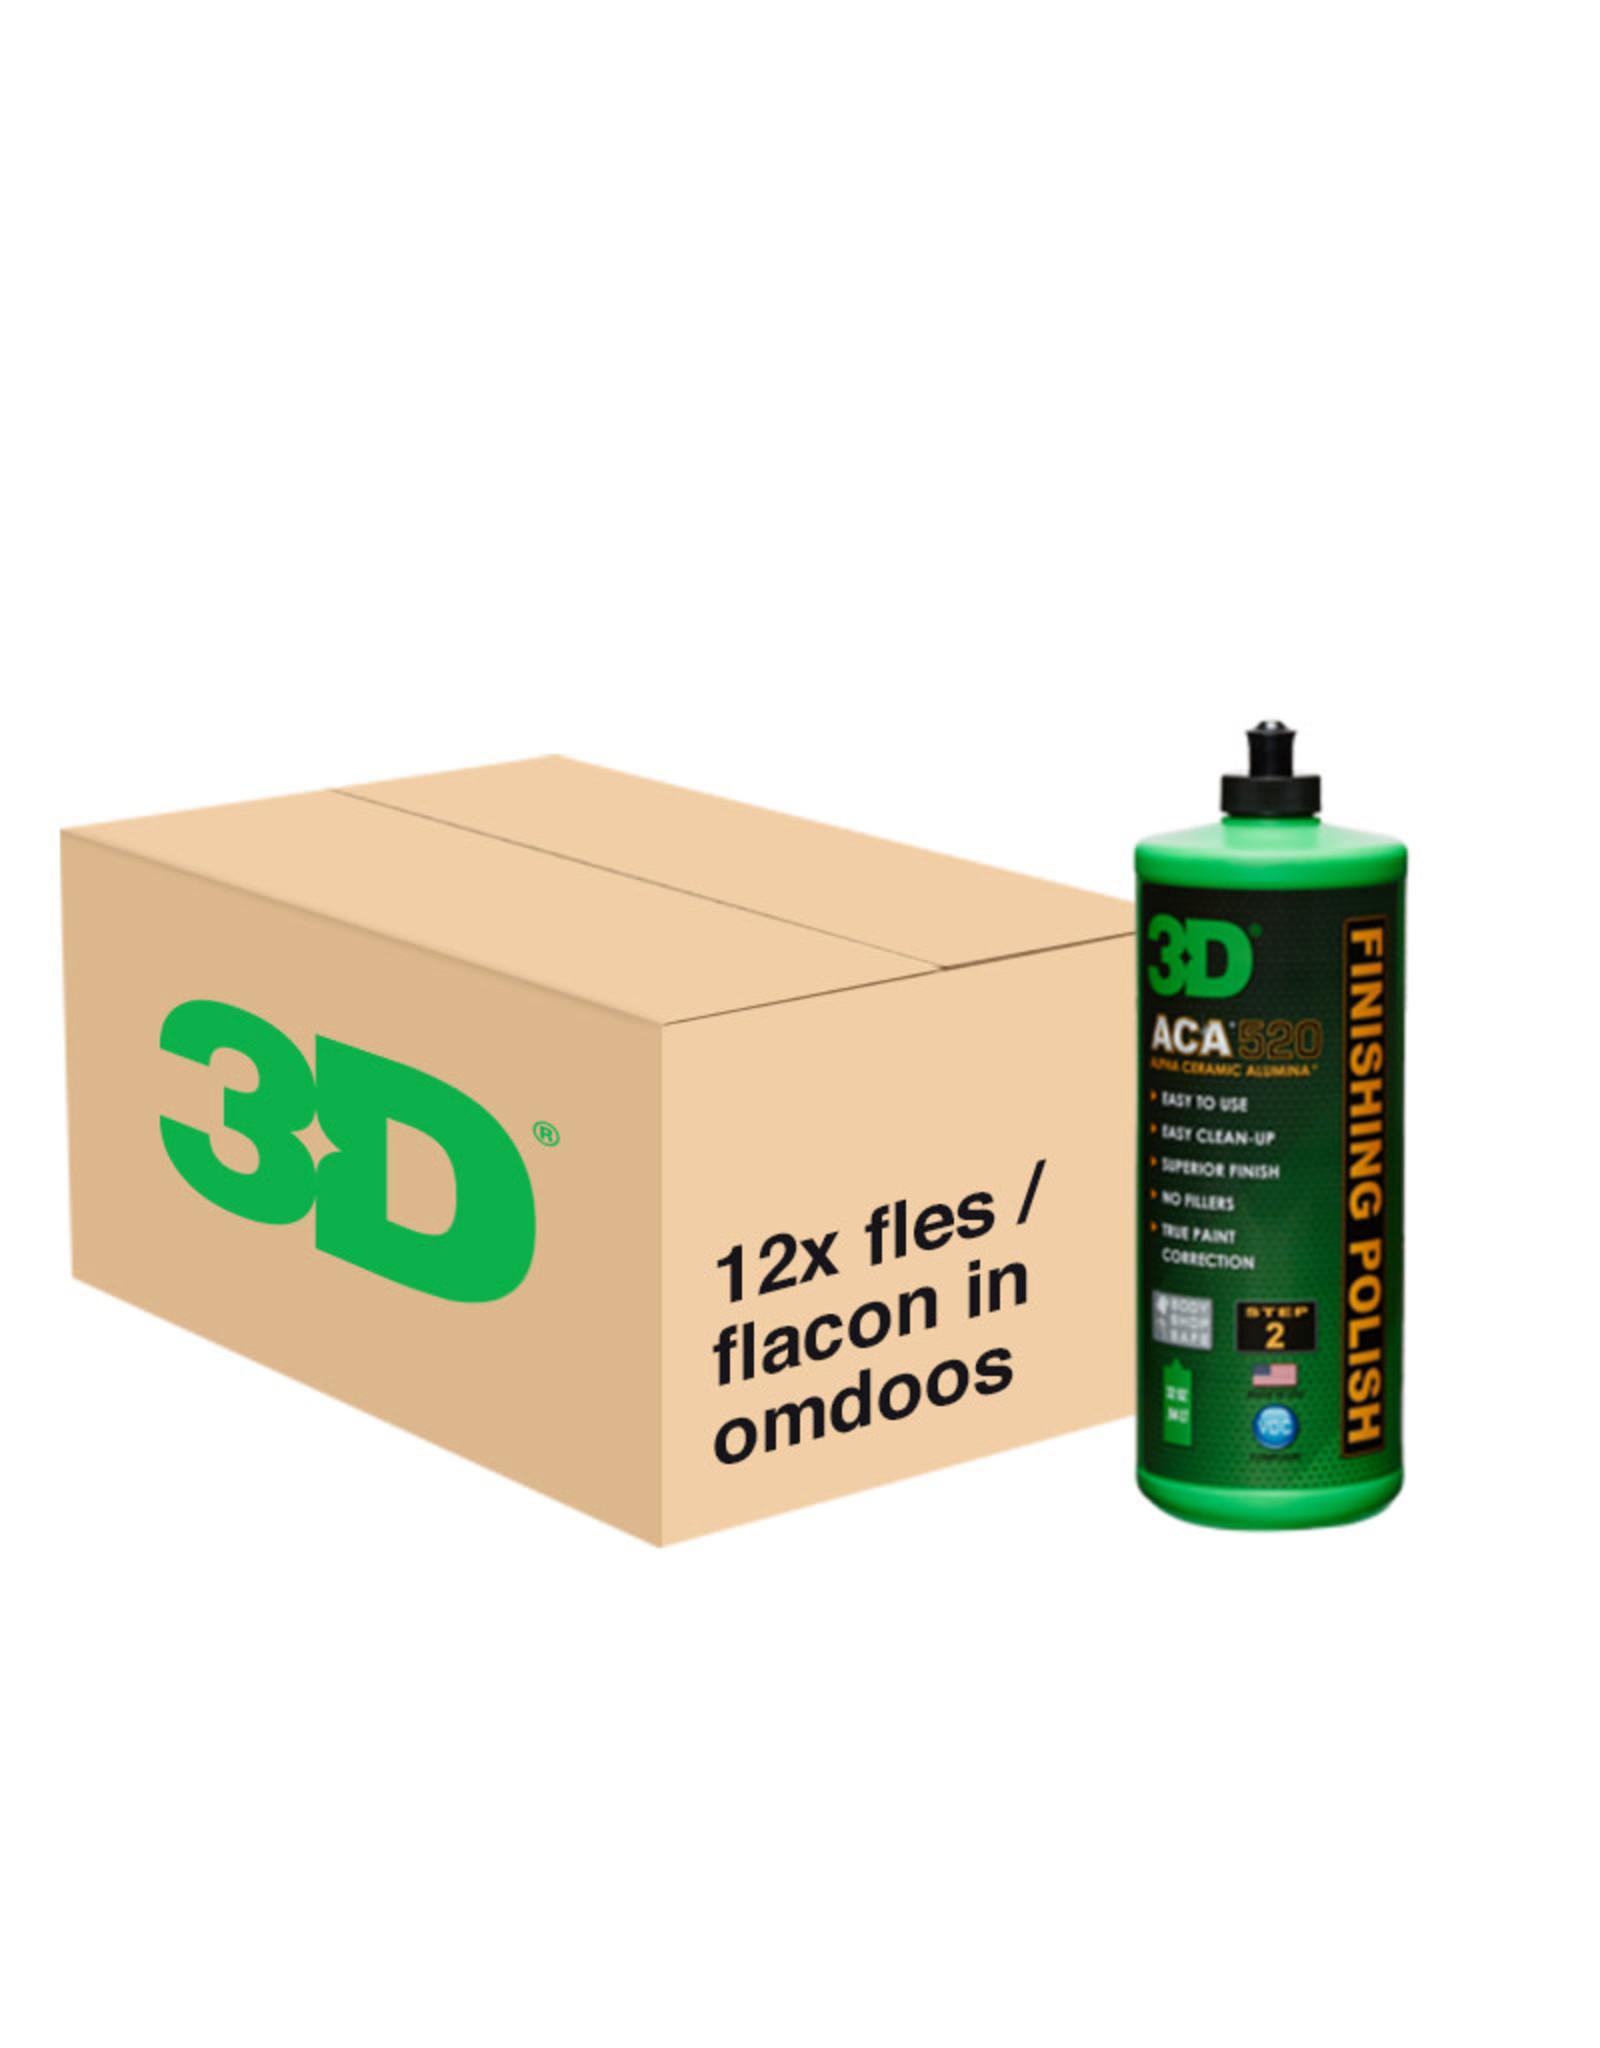 3D PRODUCTS 3D ACA Finishing Polish 520 - 12x 32 oz / 946 ml - grootverpakking